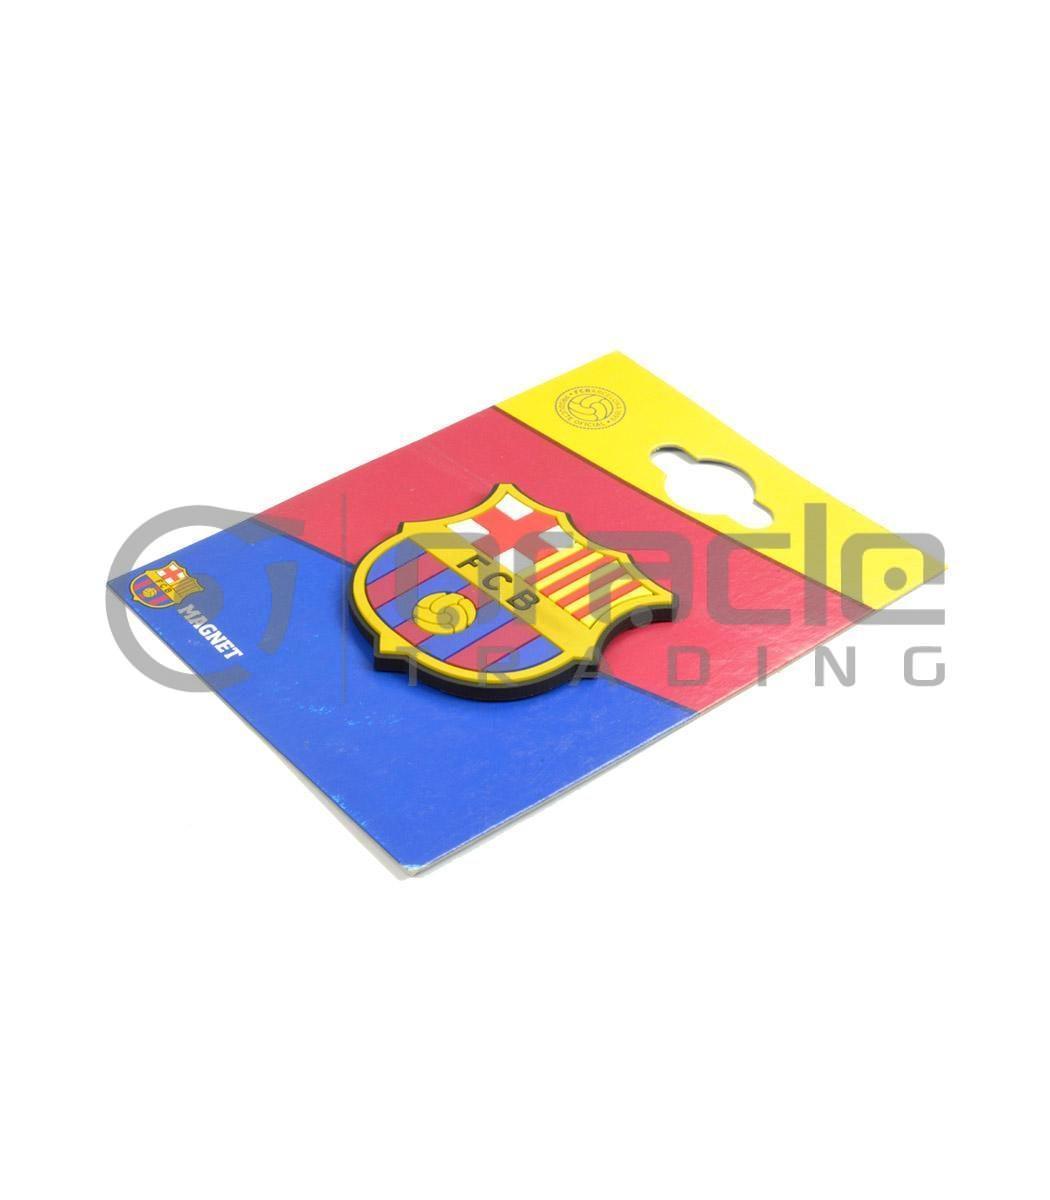 Barcelona 3D Magnet